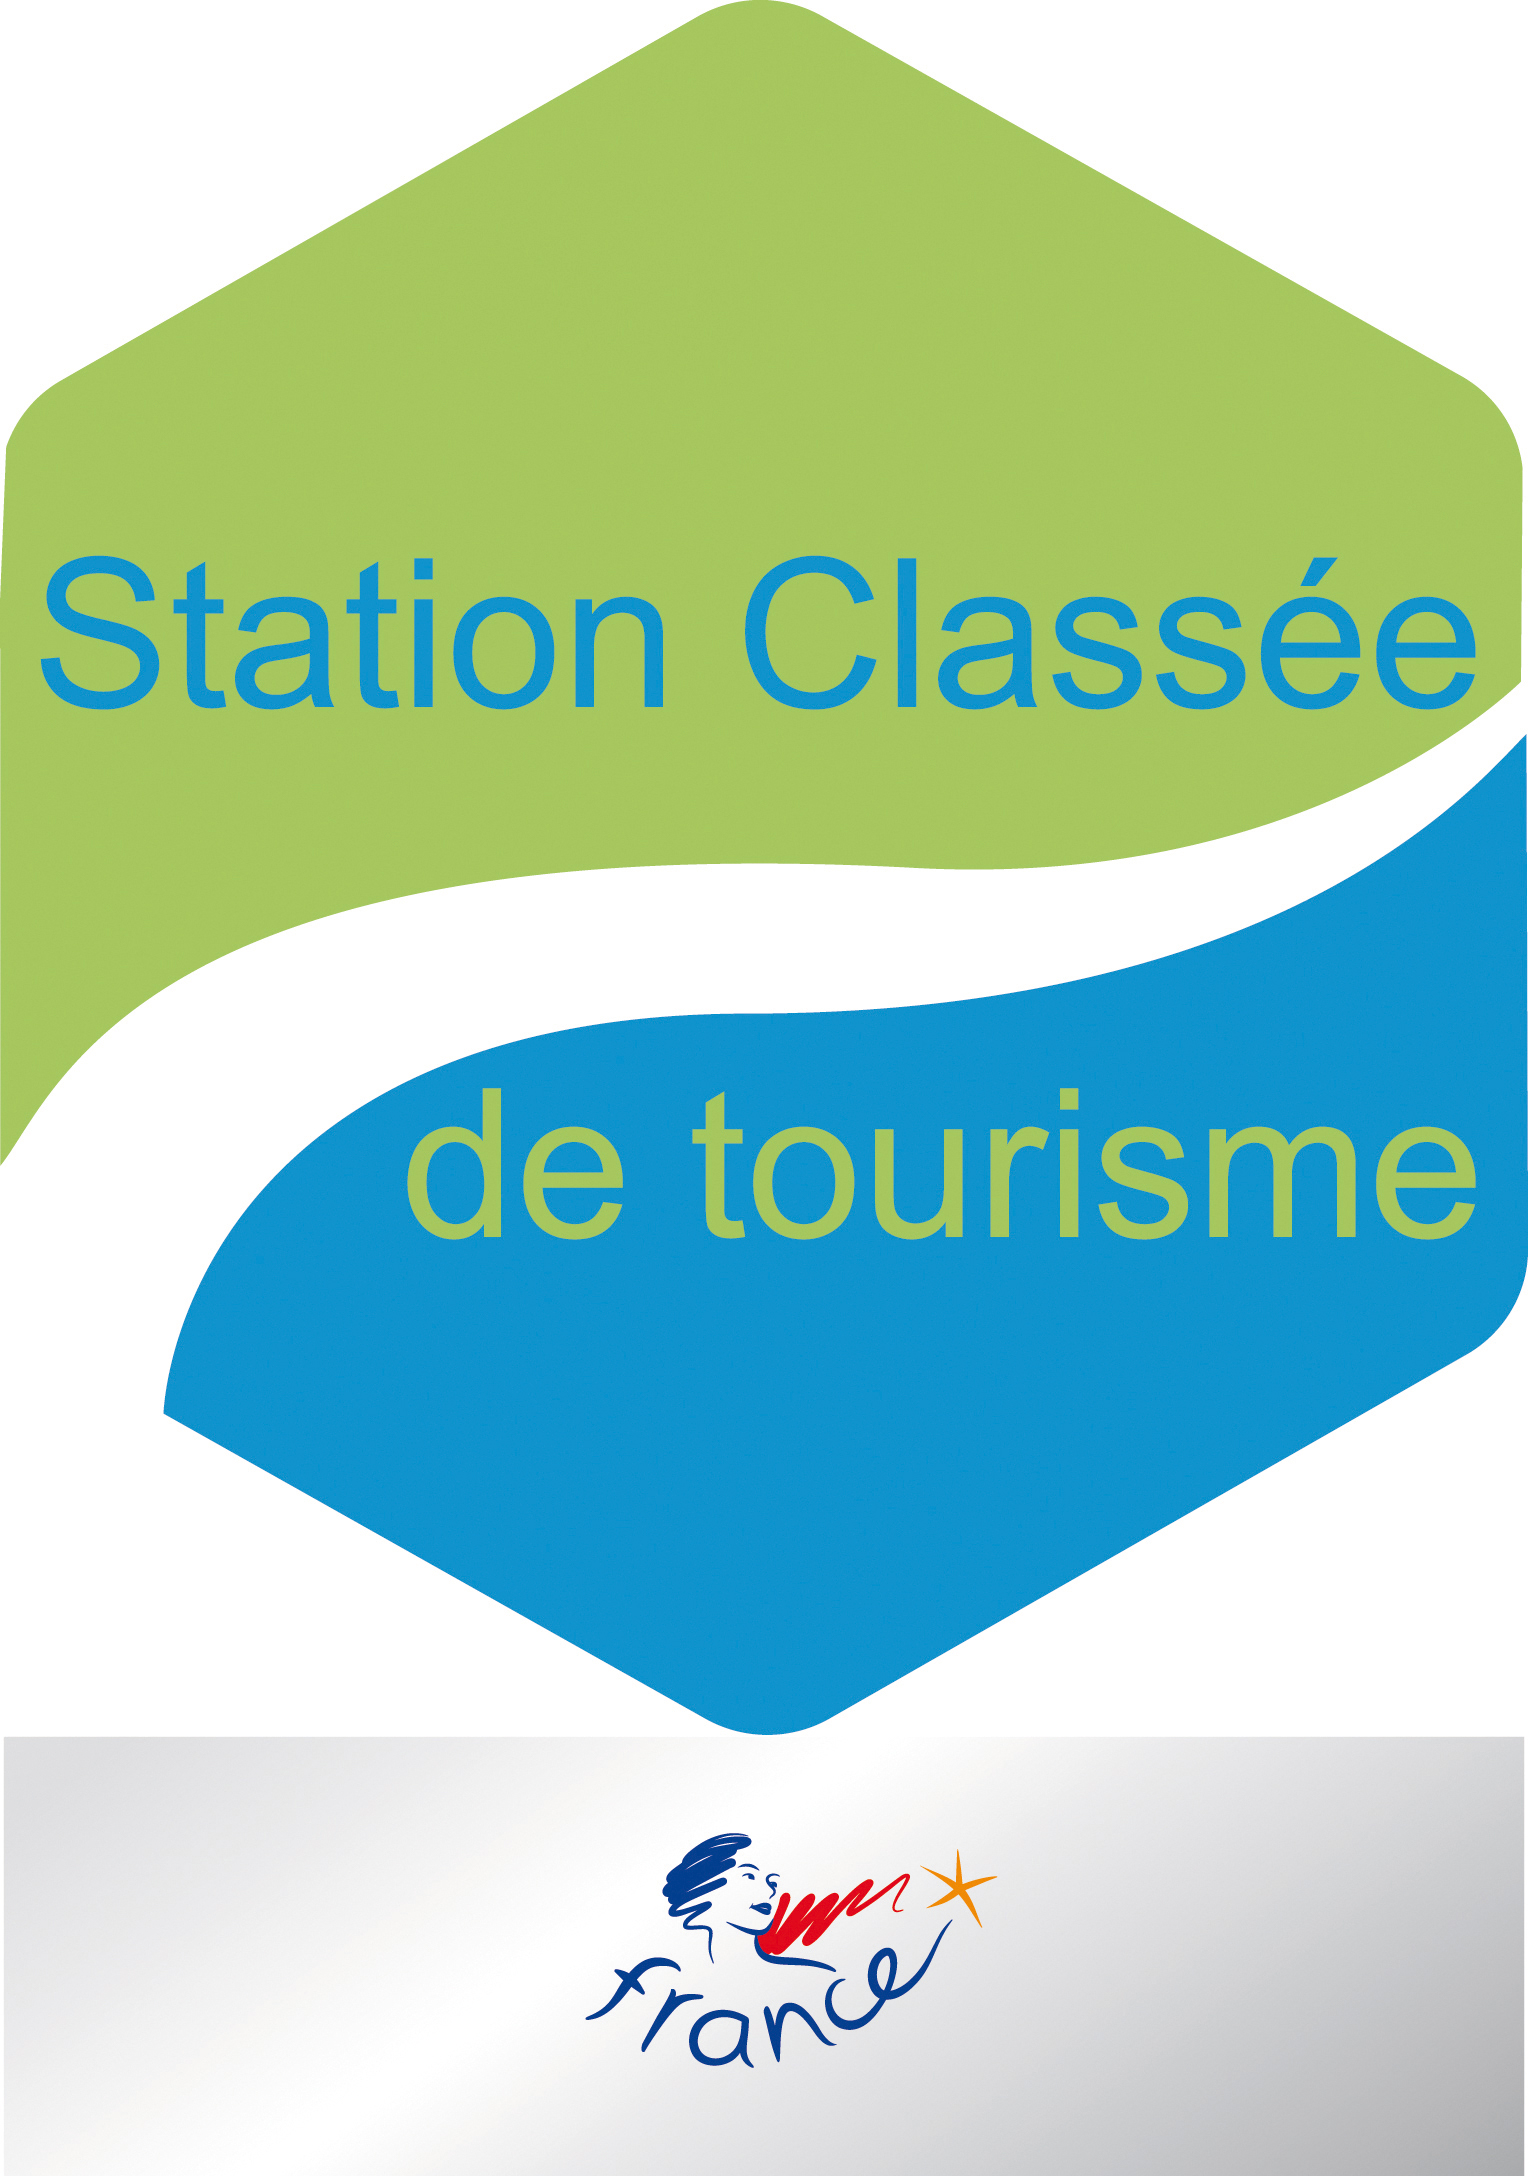 STATION_TOURISME_LOGO